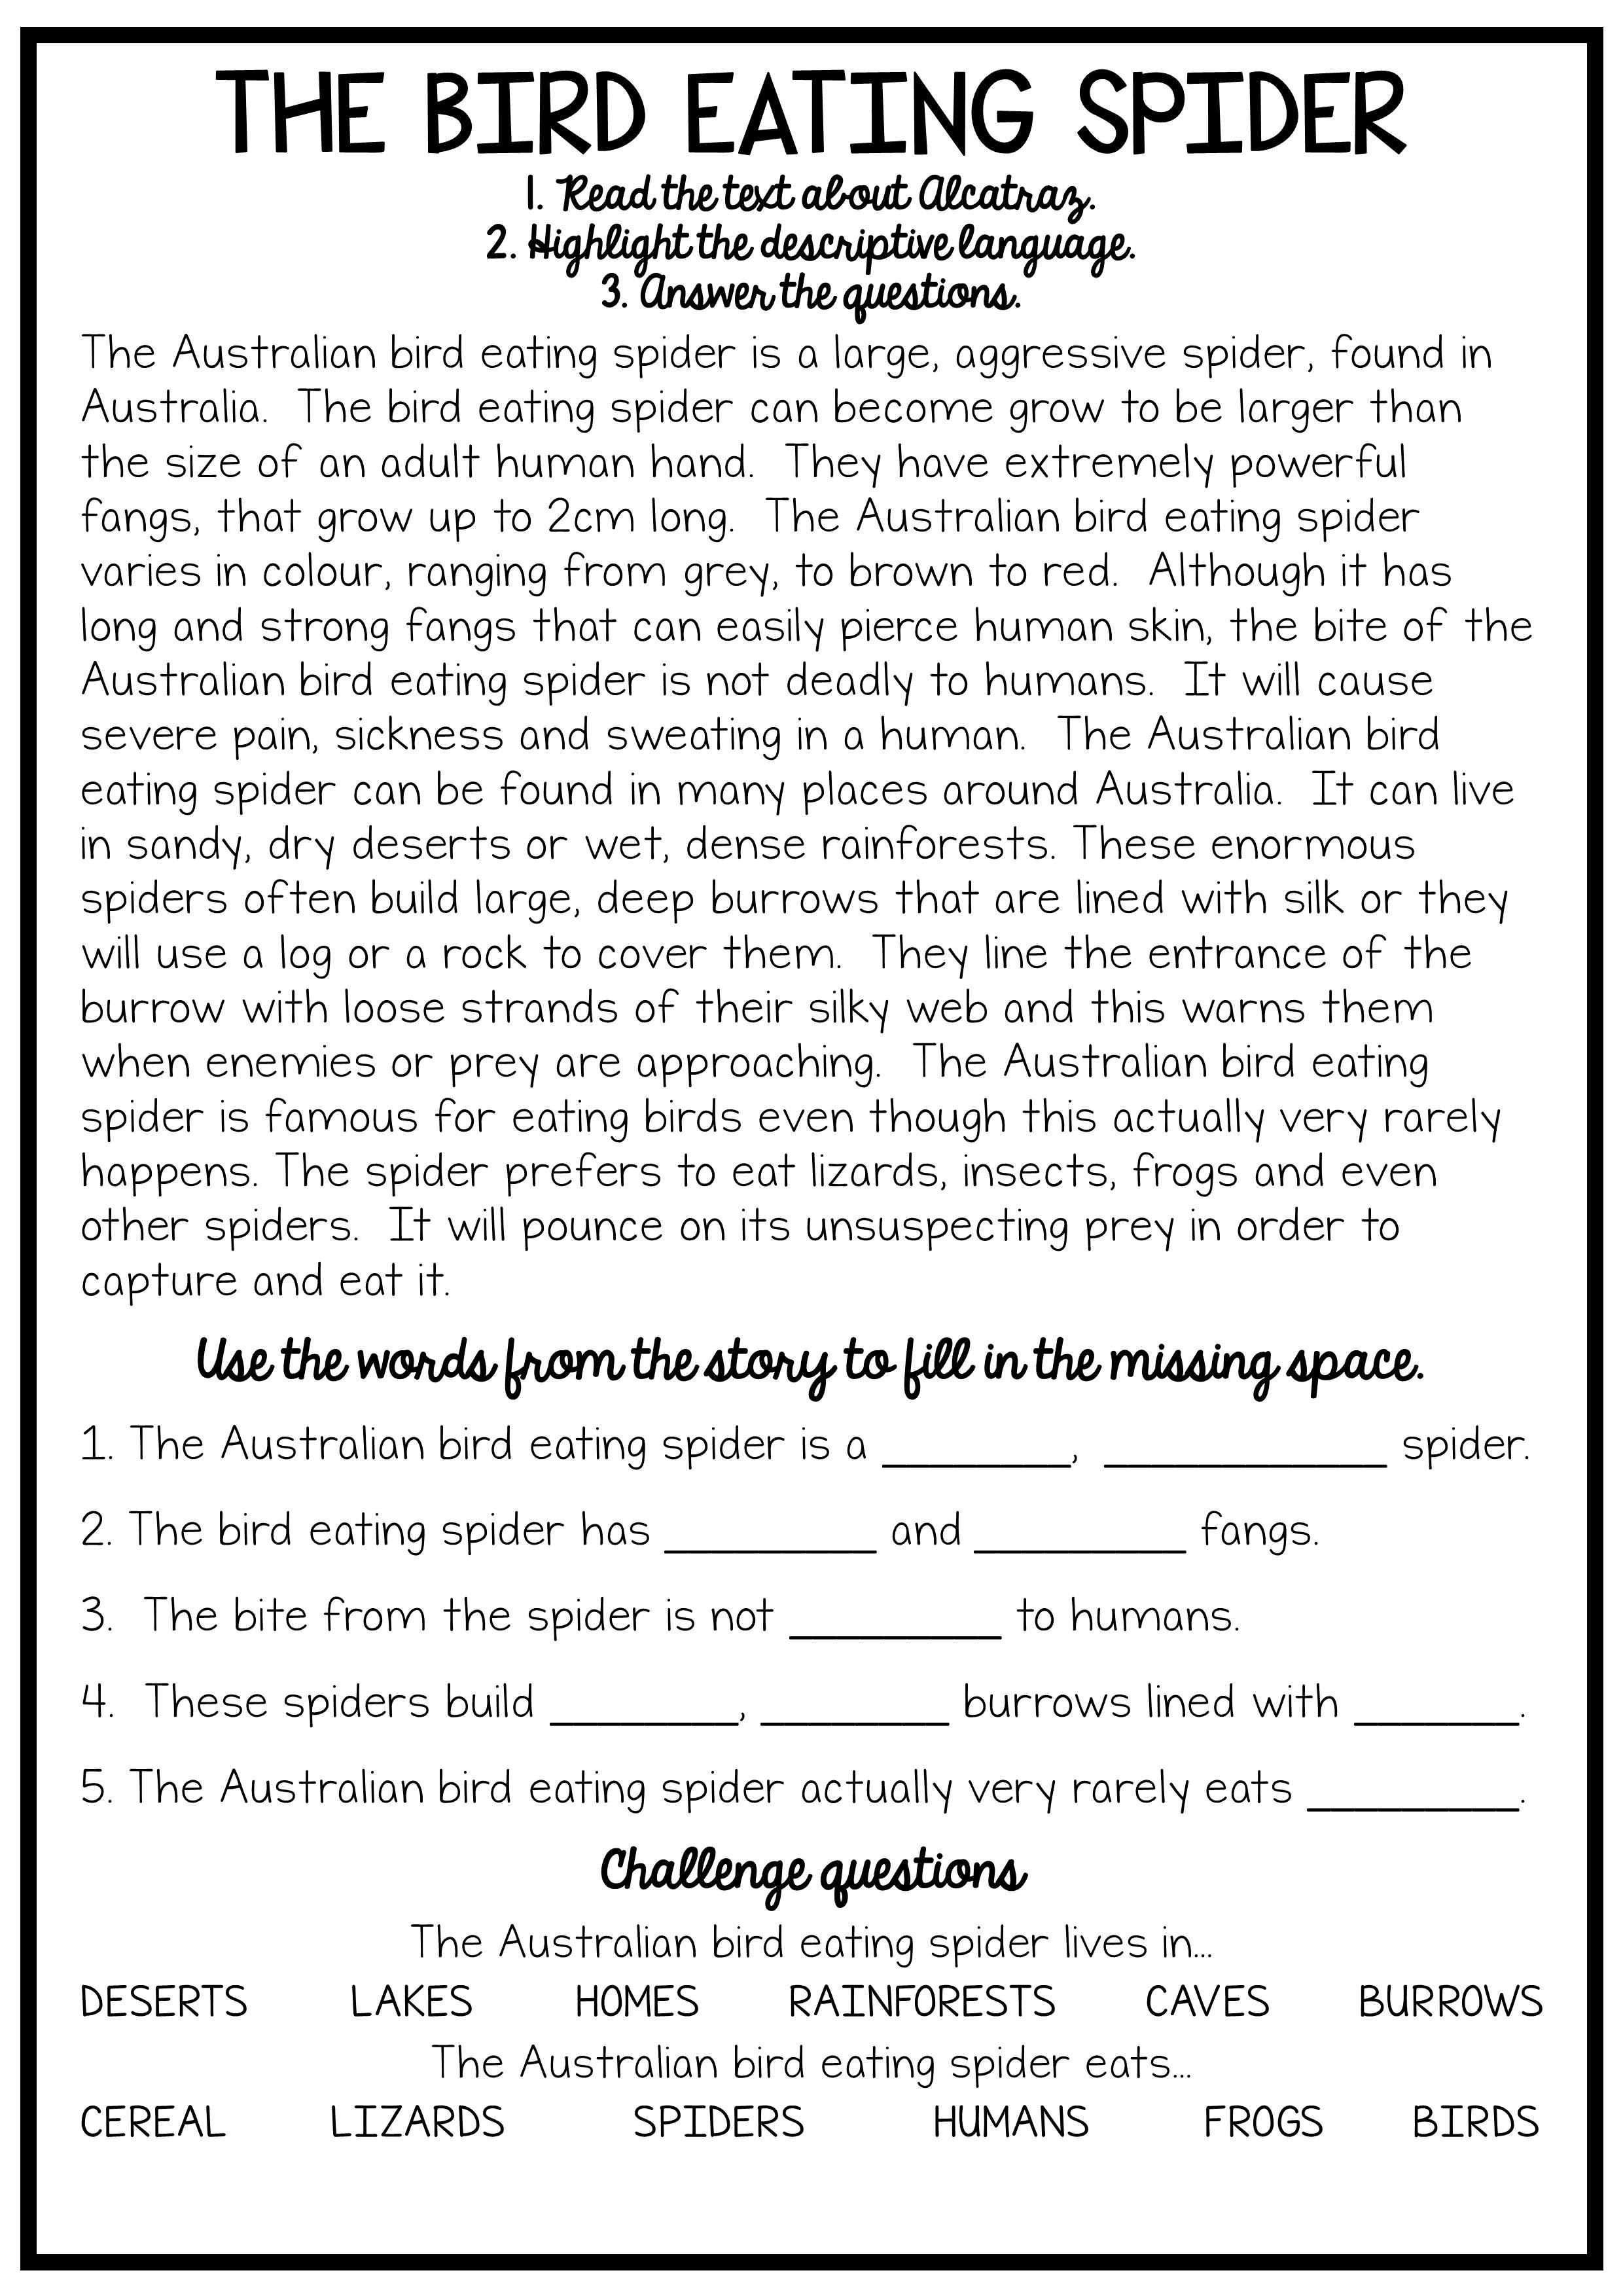 Reading And Grammar Pack No Prep Printables Reading Comprehension Passages Comprehension Passage Reading Comprehension Worksheets [ 3508 x 2480 Pixel ]